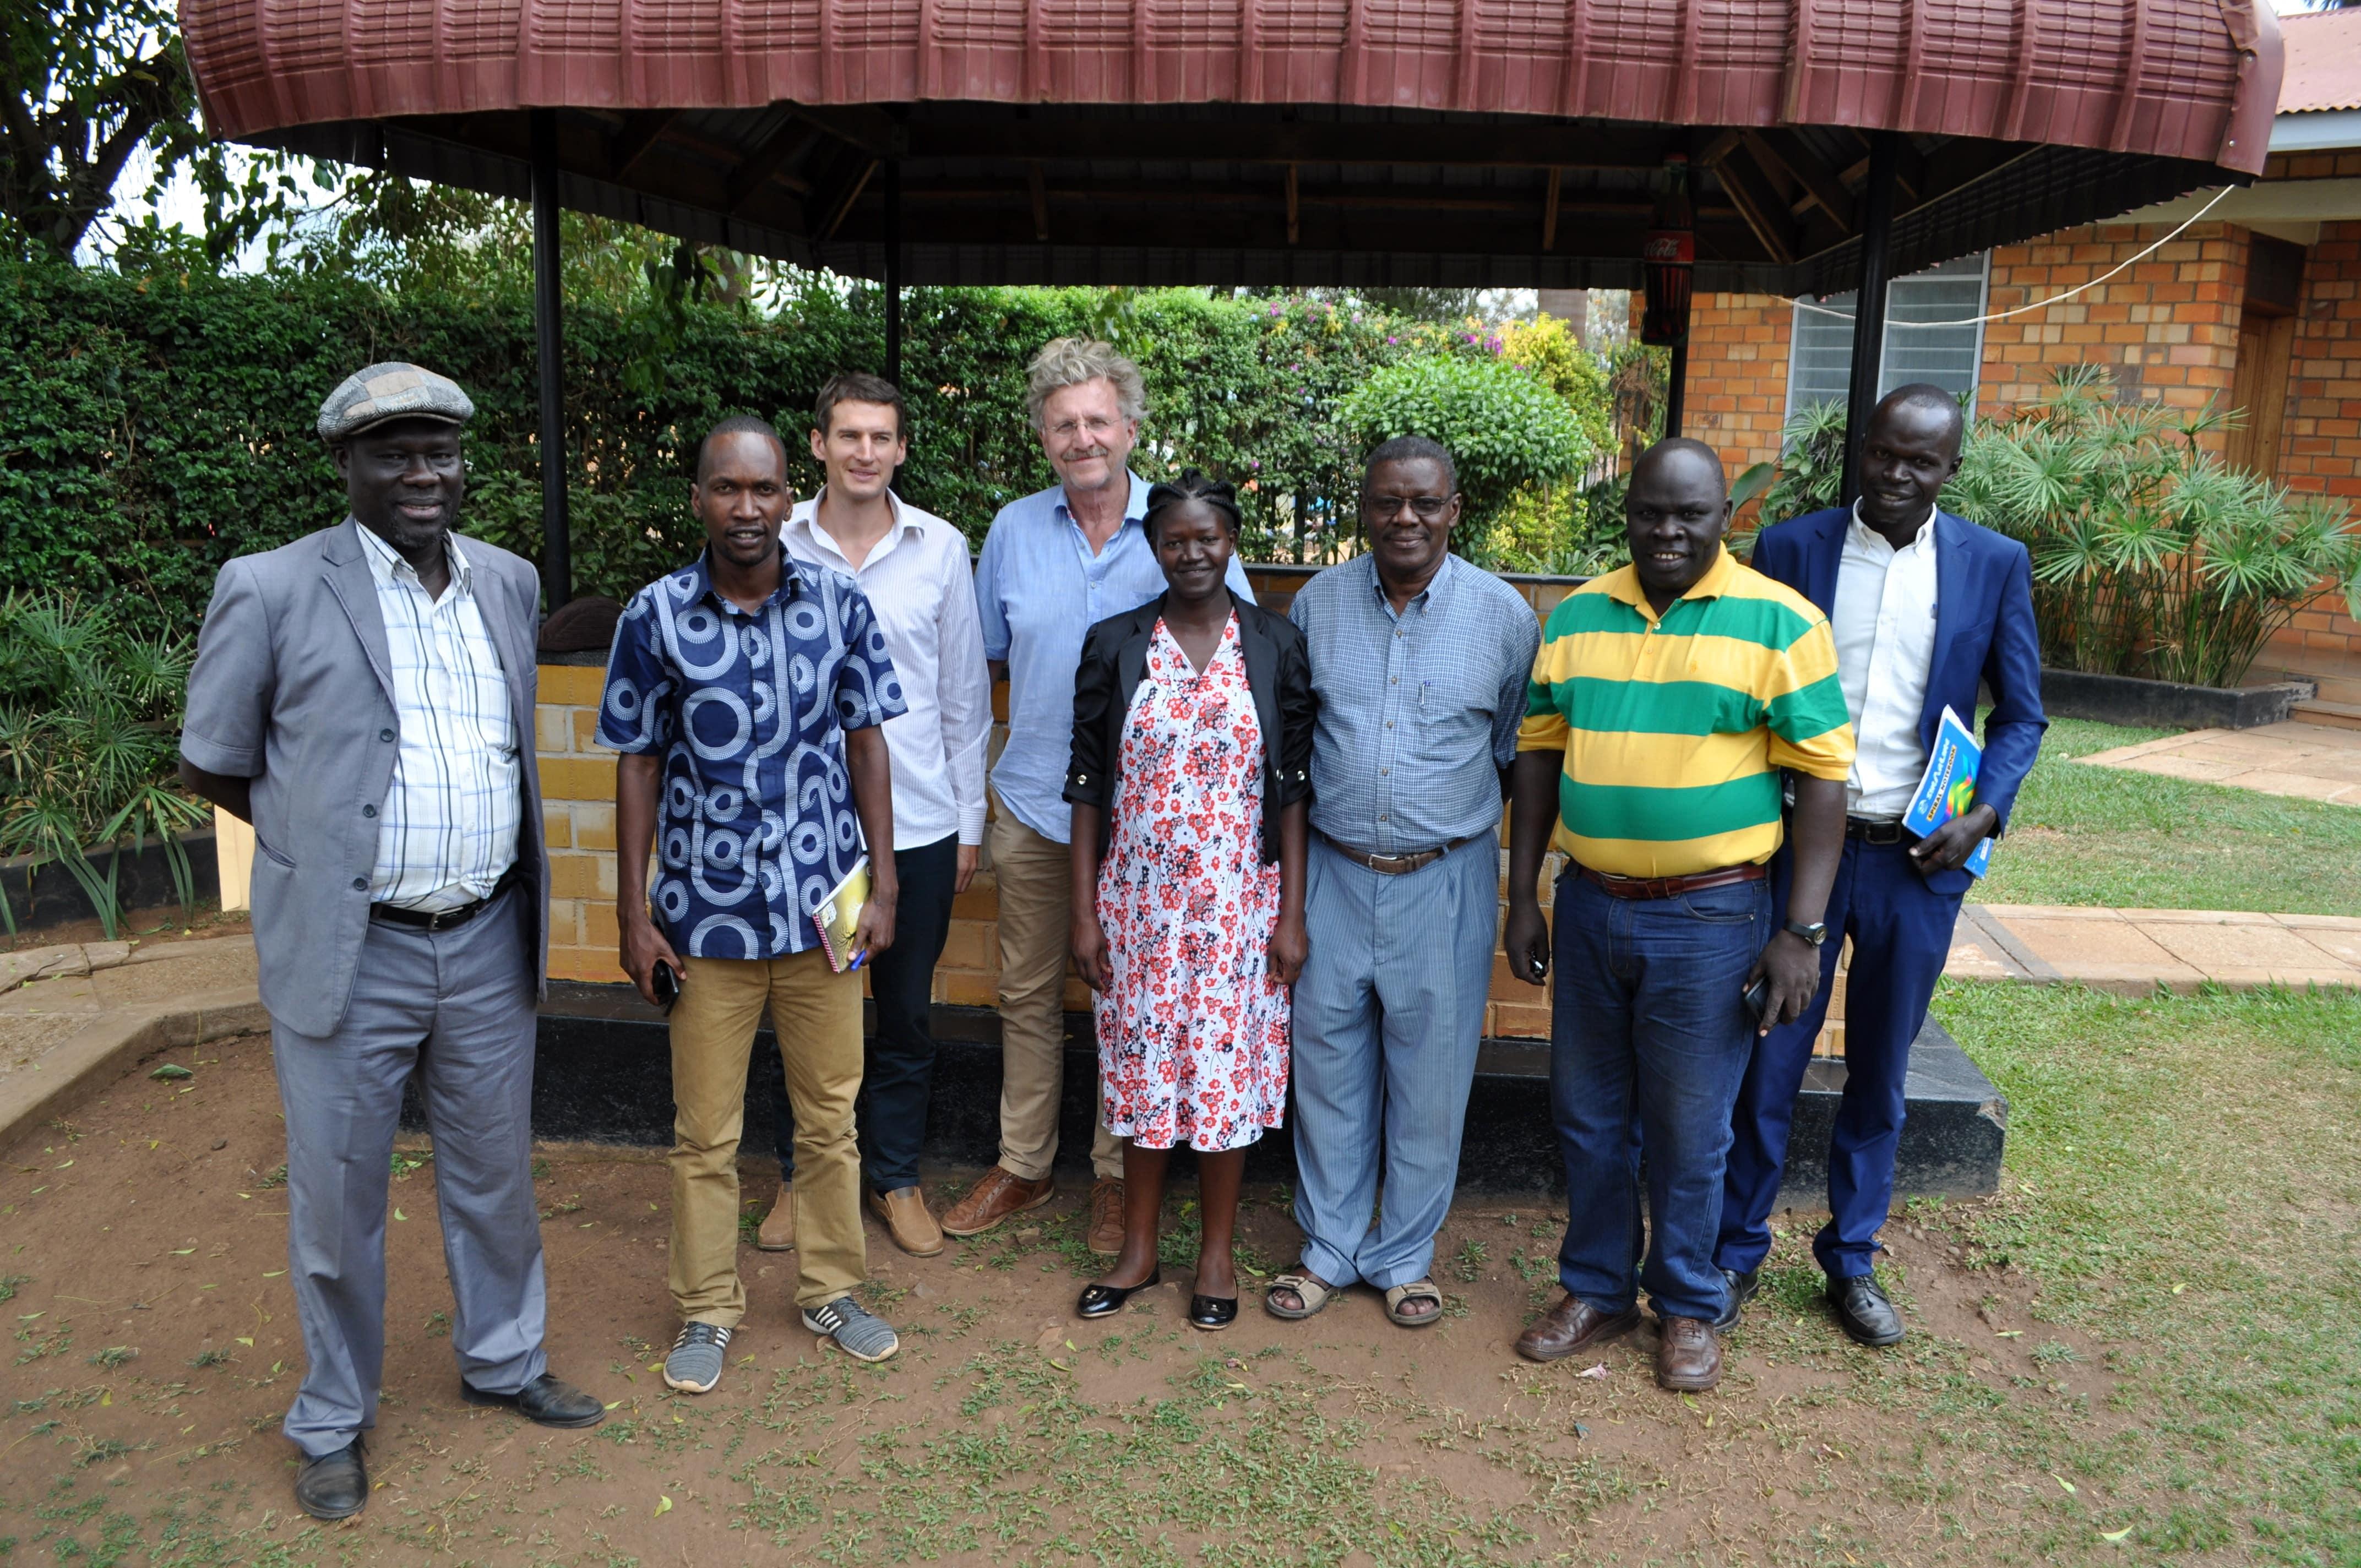 Uganda team Vocational Education and Training (VET) Africa 4.0-min